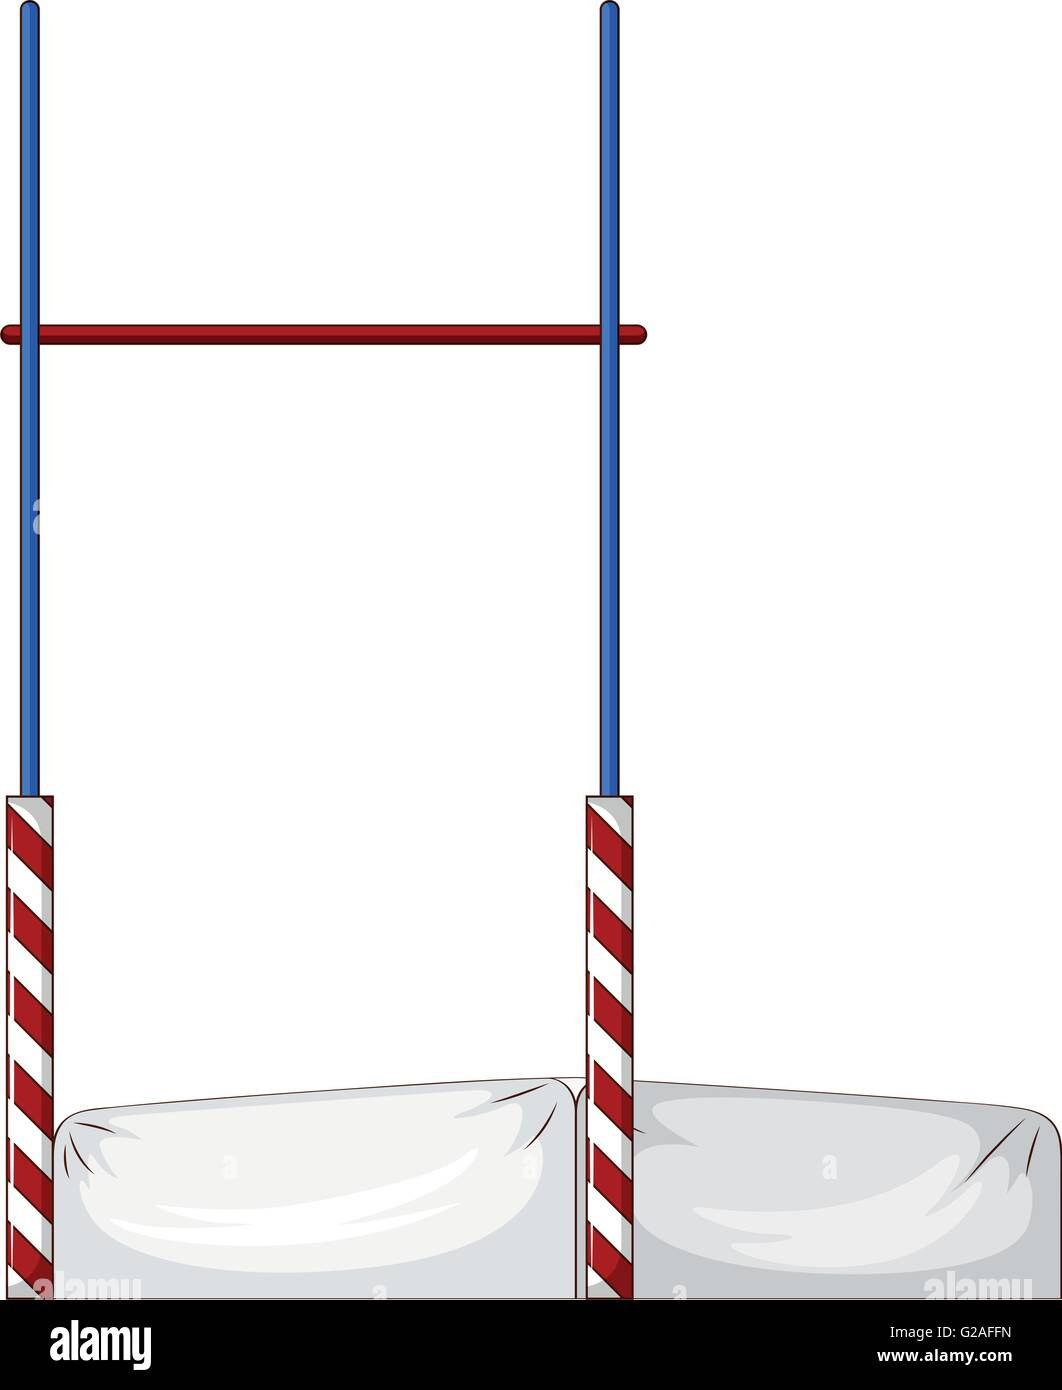 High jump pole and mattress illustration - Stock Vector